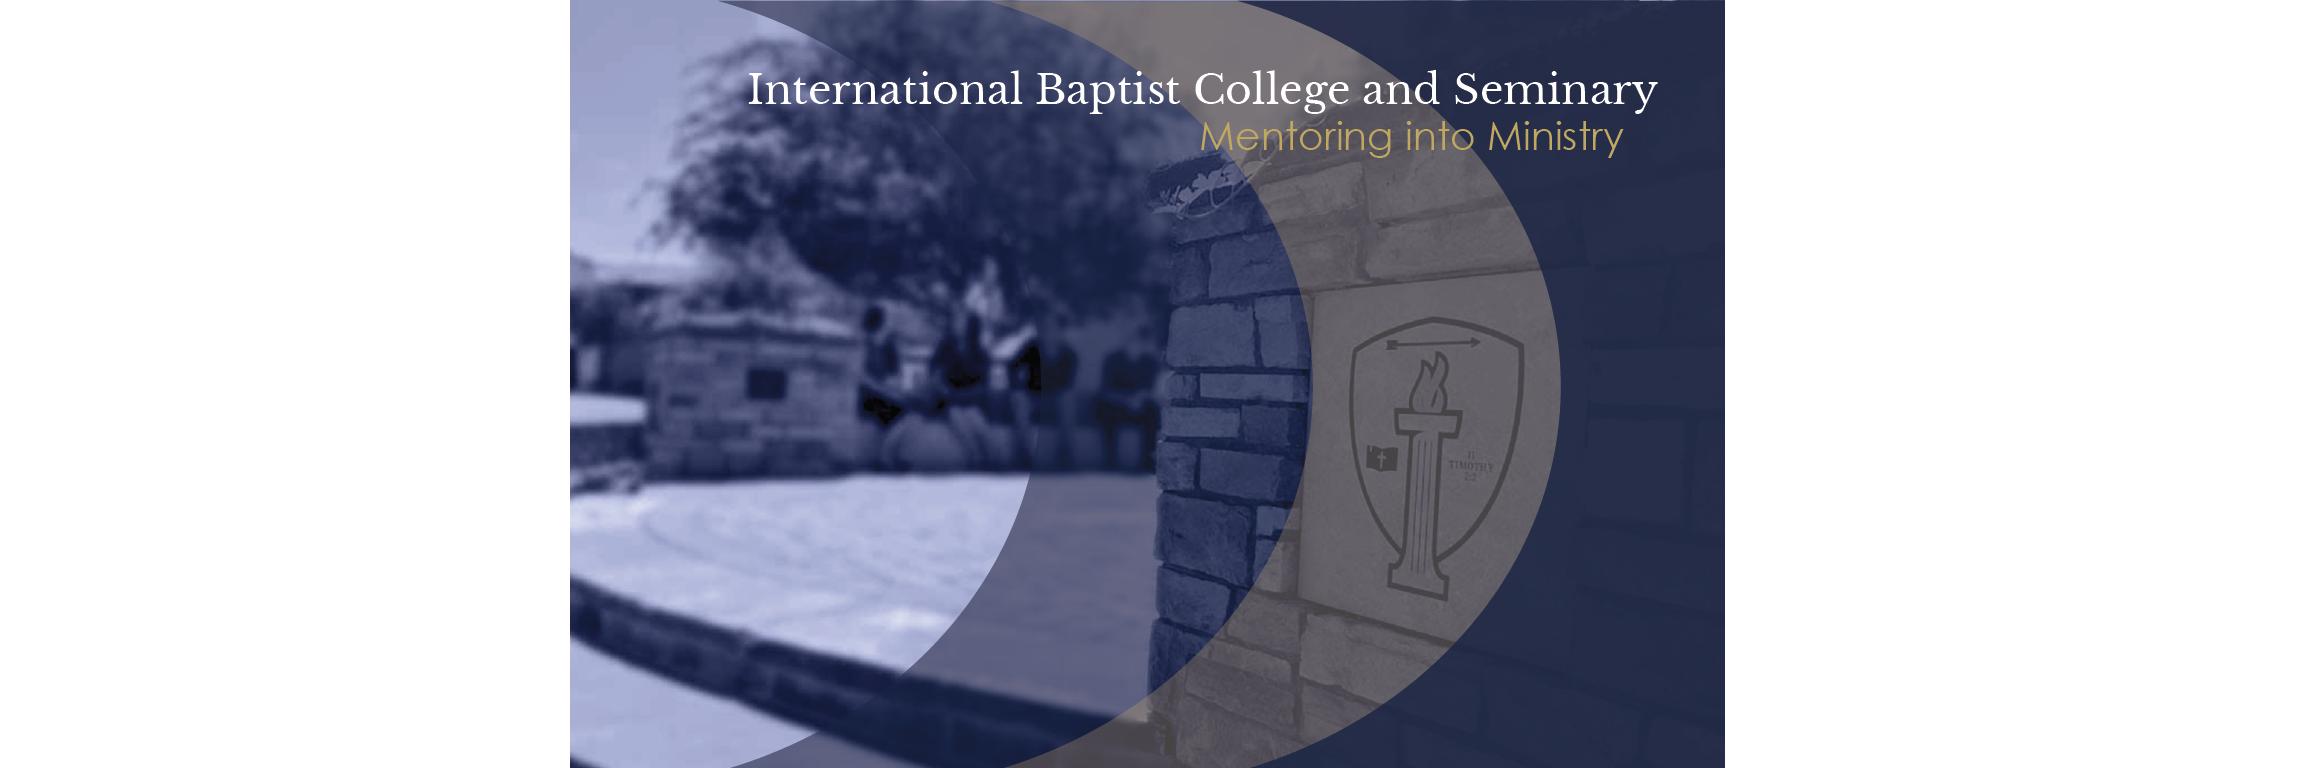 International Baptist College - International Baptist College & Seminary